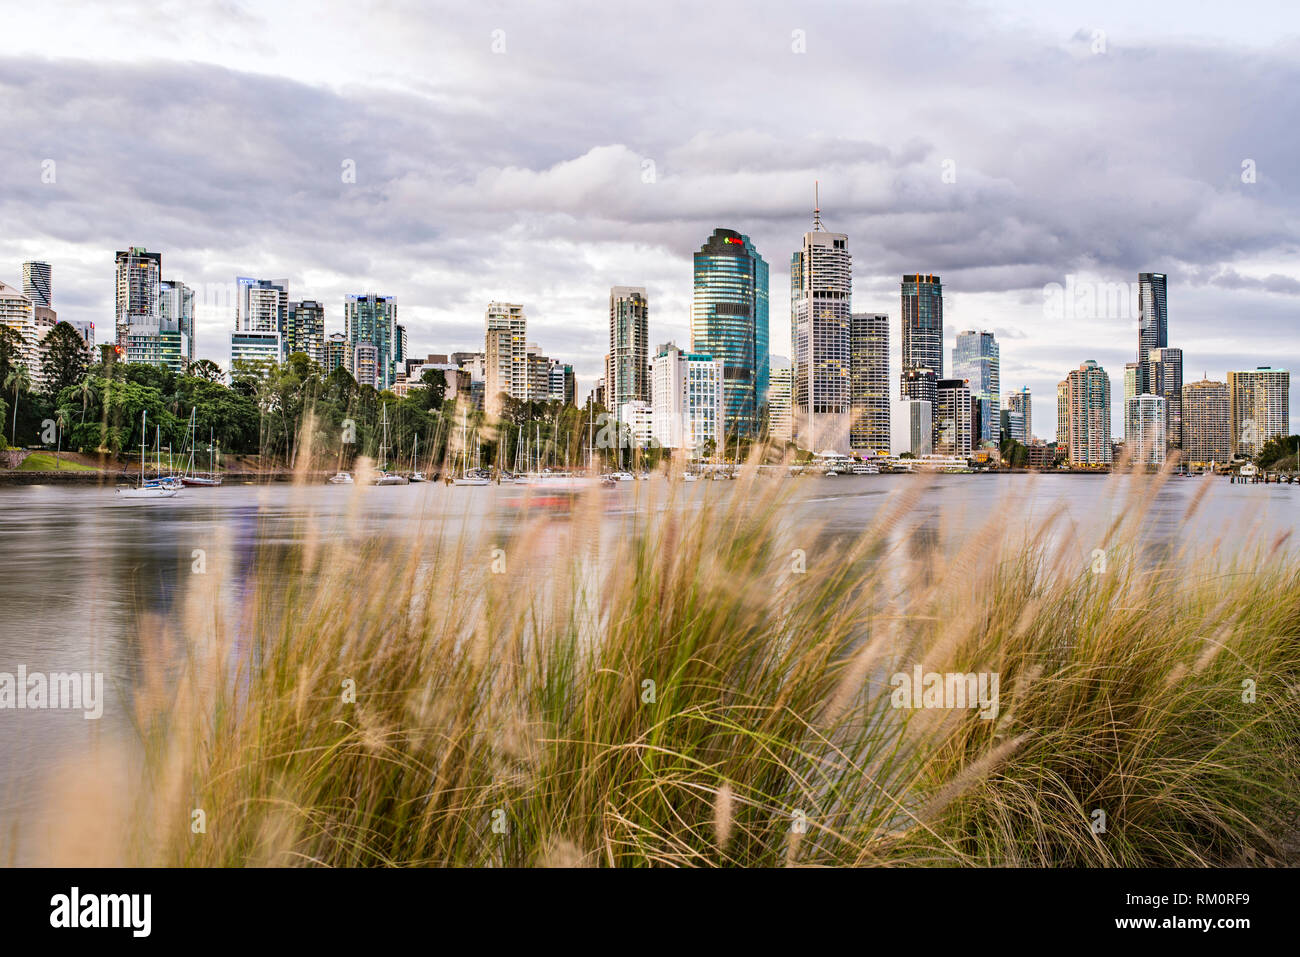 The Brisbane skyline. - Stock Image